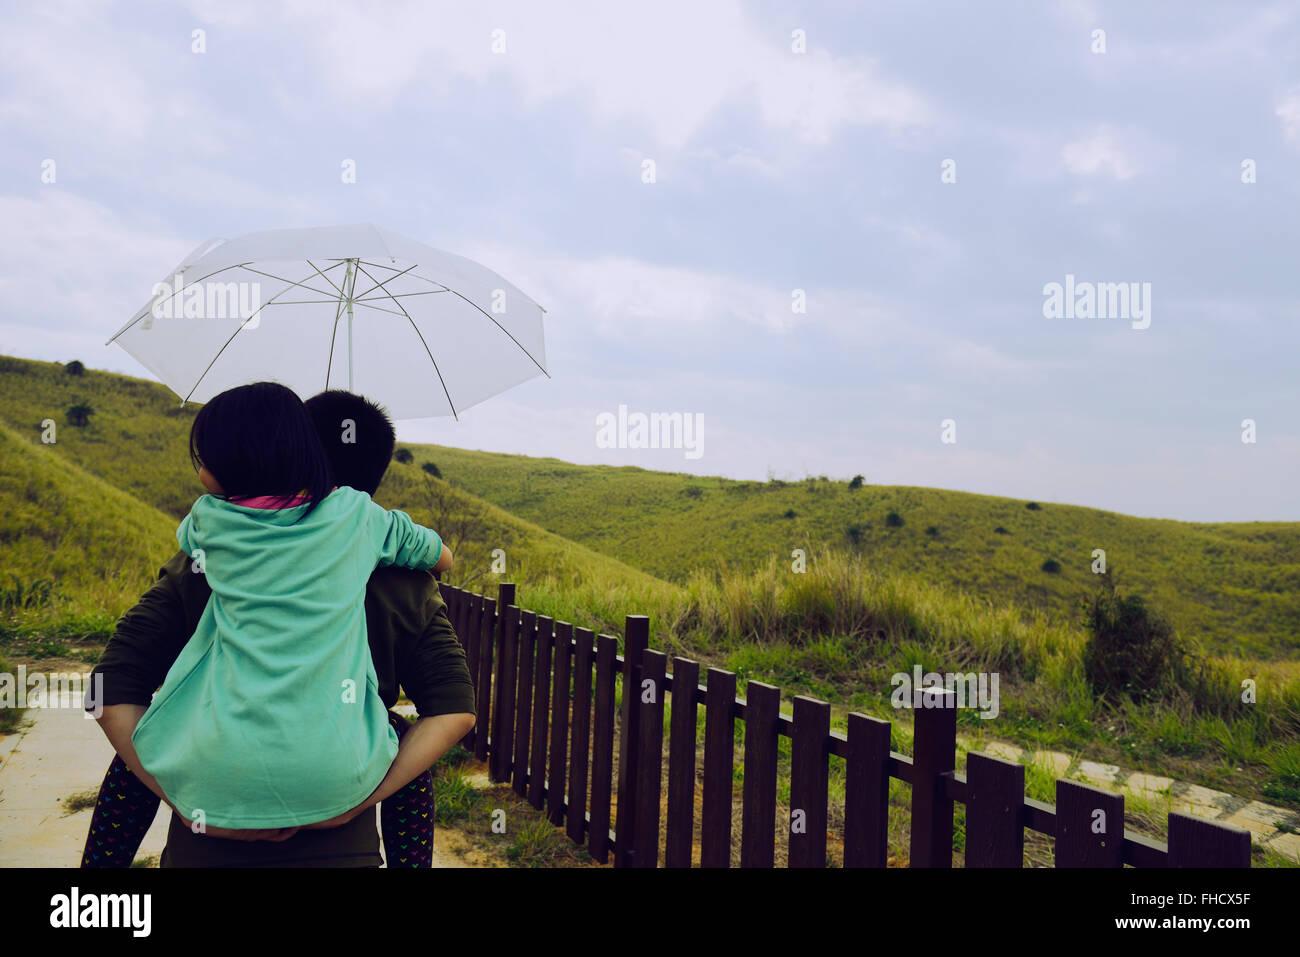 Hija de Padre Volver tomar paraguas ,chica en la espalda del padre llevar paraguas,Padre dando joven hija piggyback Imagen De Stock